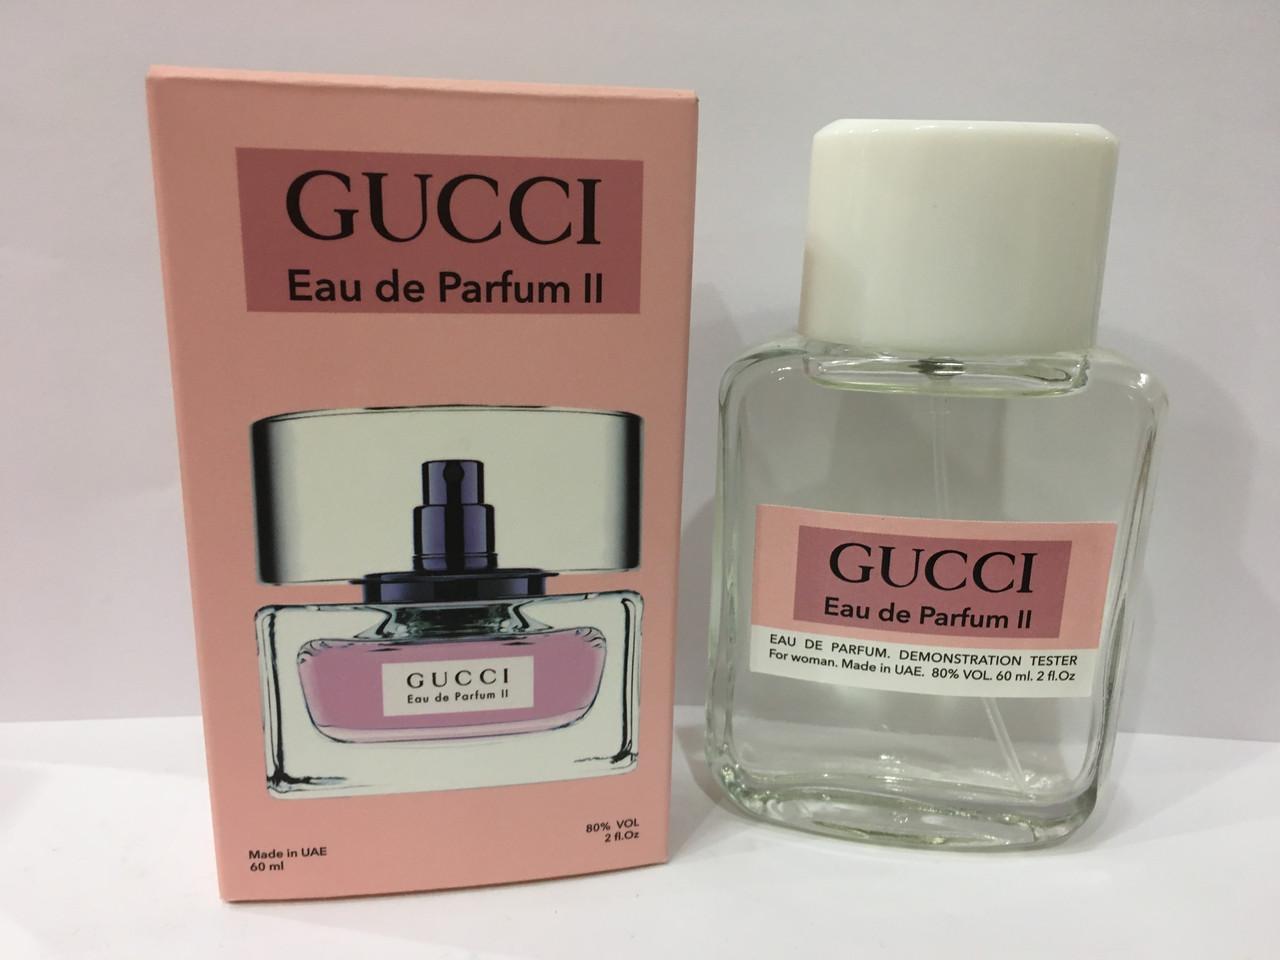 Жіночі парфуми міні тестер Gucci Parfum 2 DutyFree 60 мл (Гуччі Парфум 2)